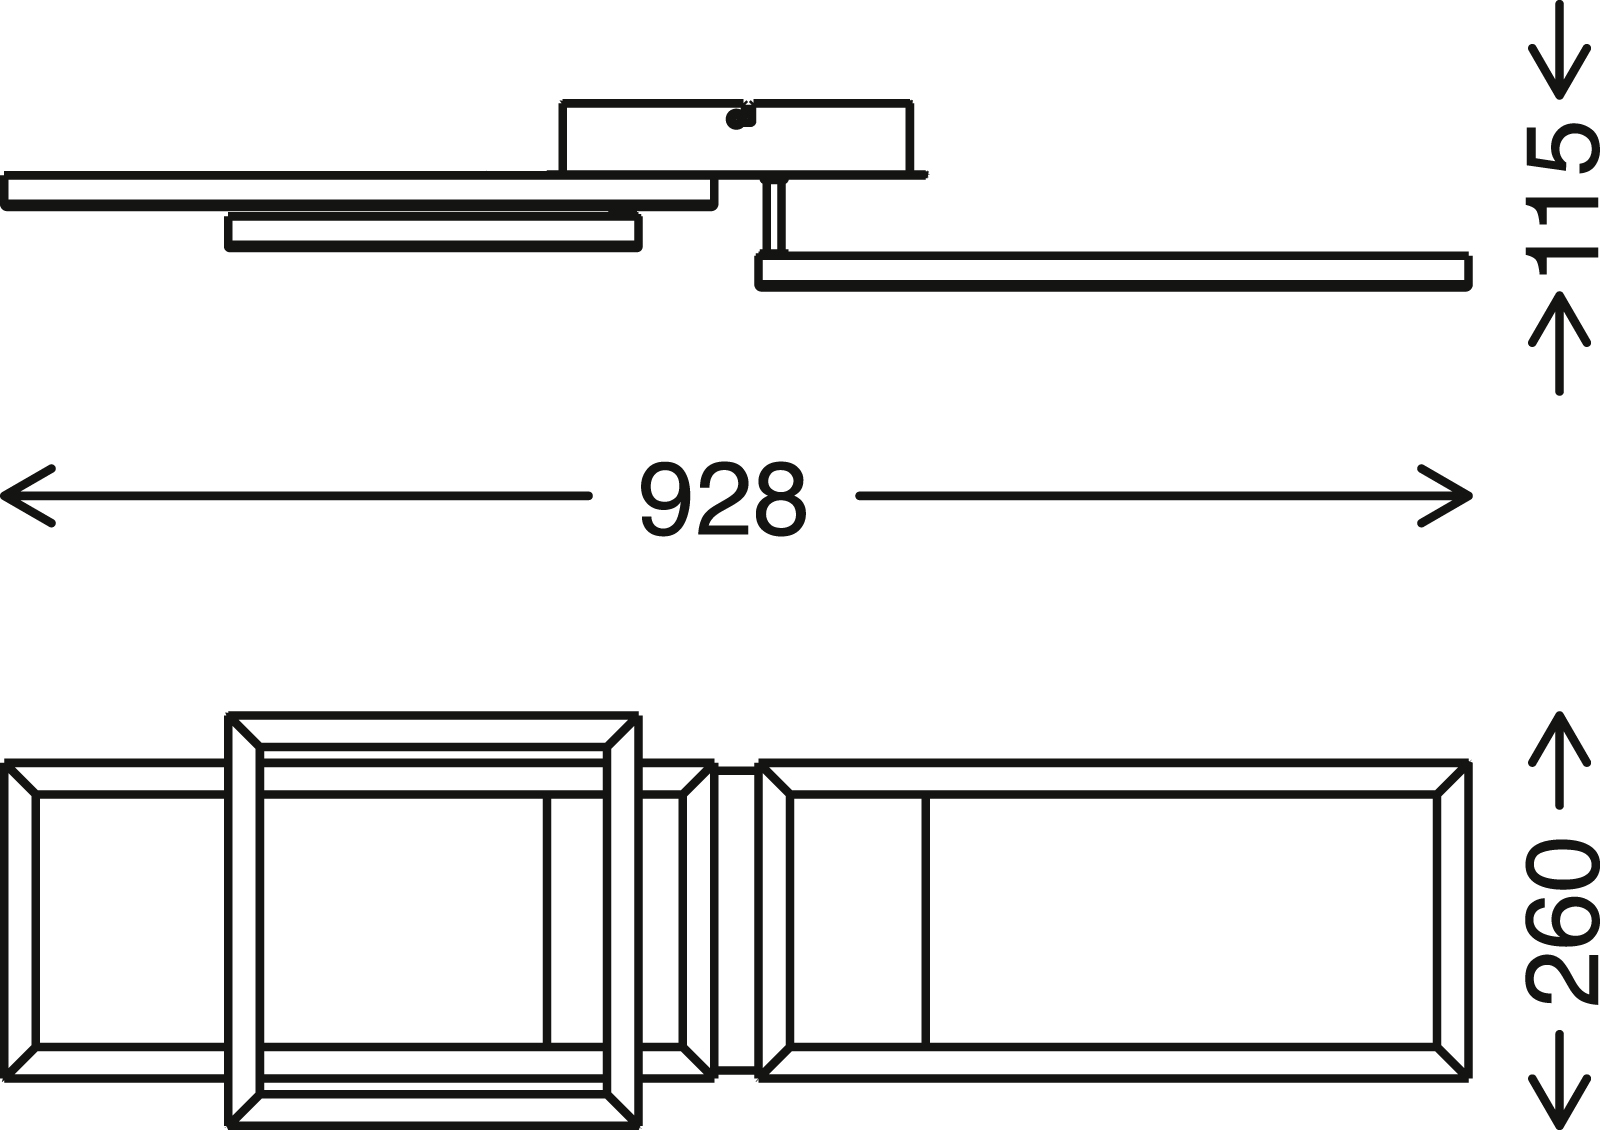 TELEFUNKEN Smart LED Deckenleuchte, 92,8 cm, 30 W, Chrom-Alu